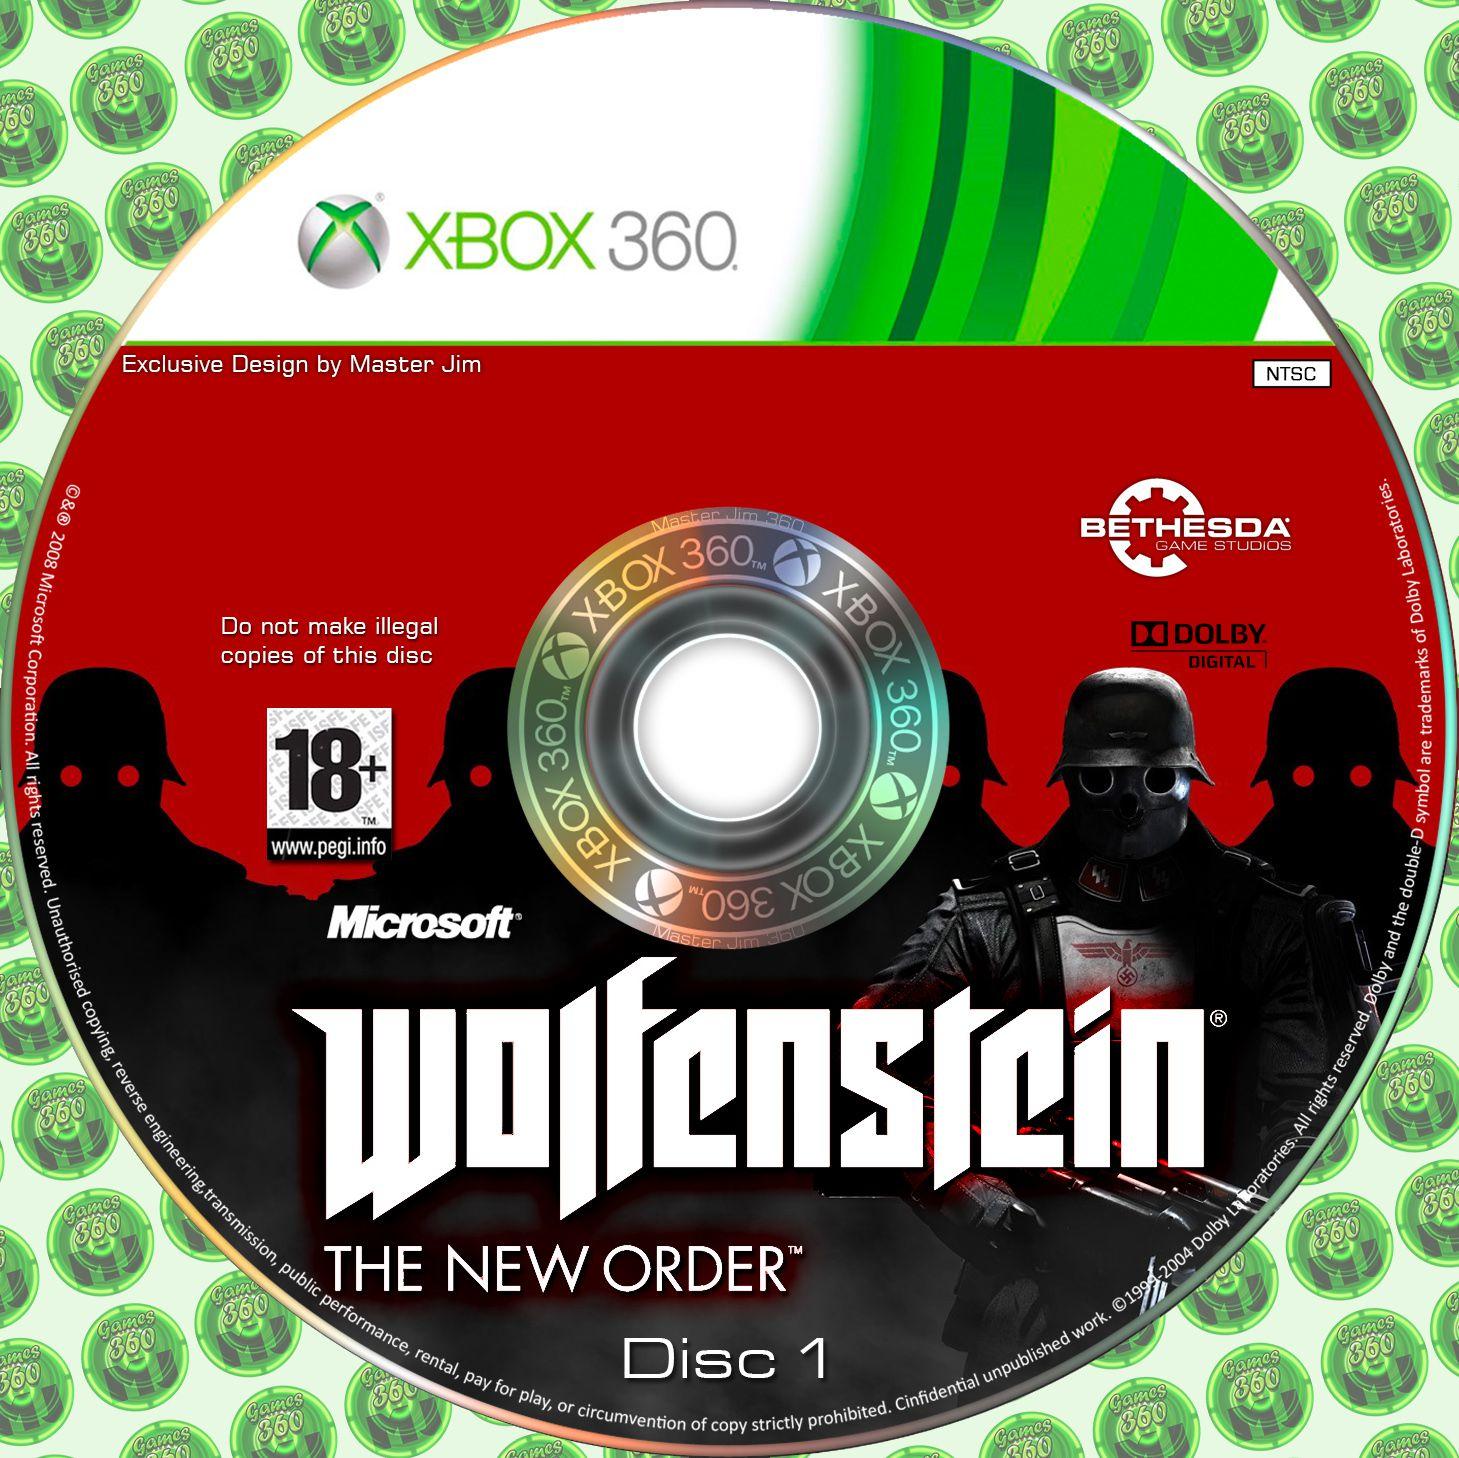 Label Walfenstein The New Order Disc 1 Xbox 360